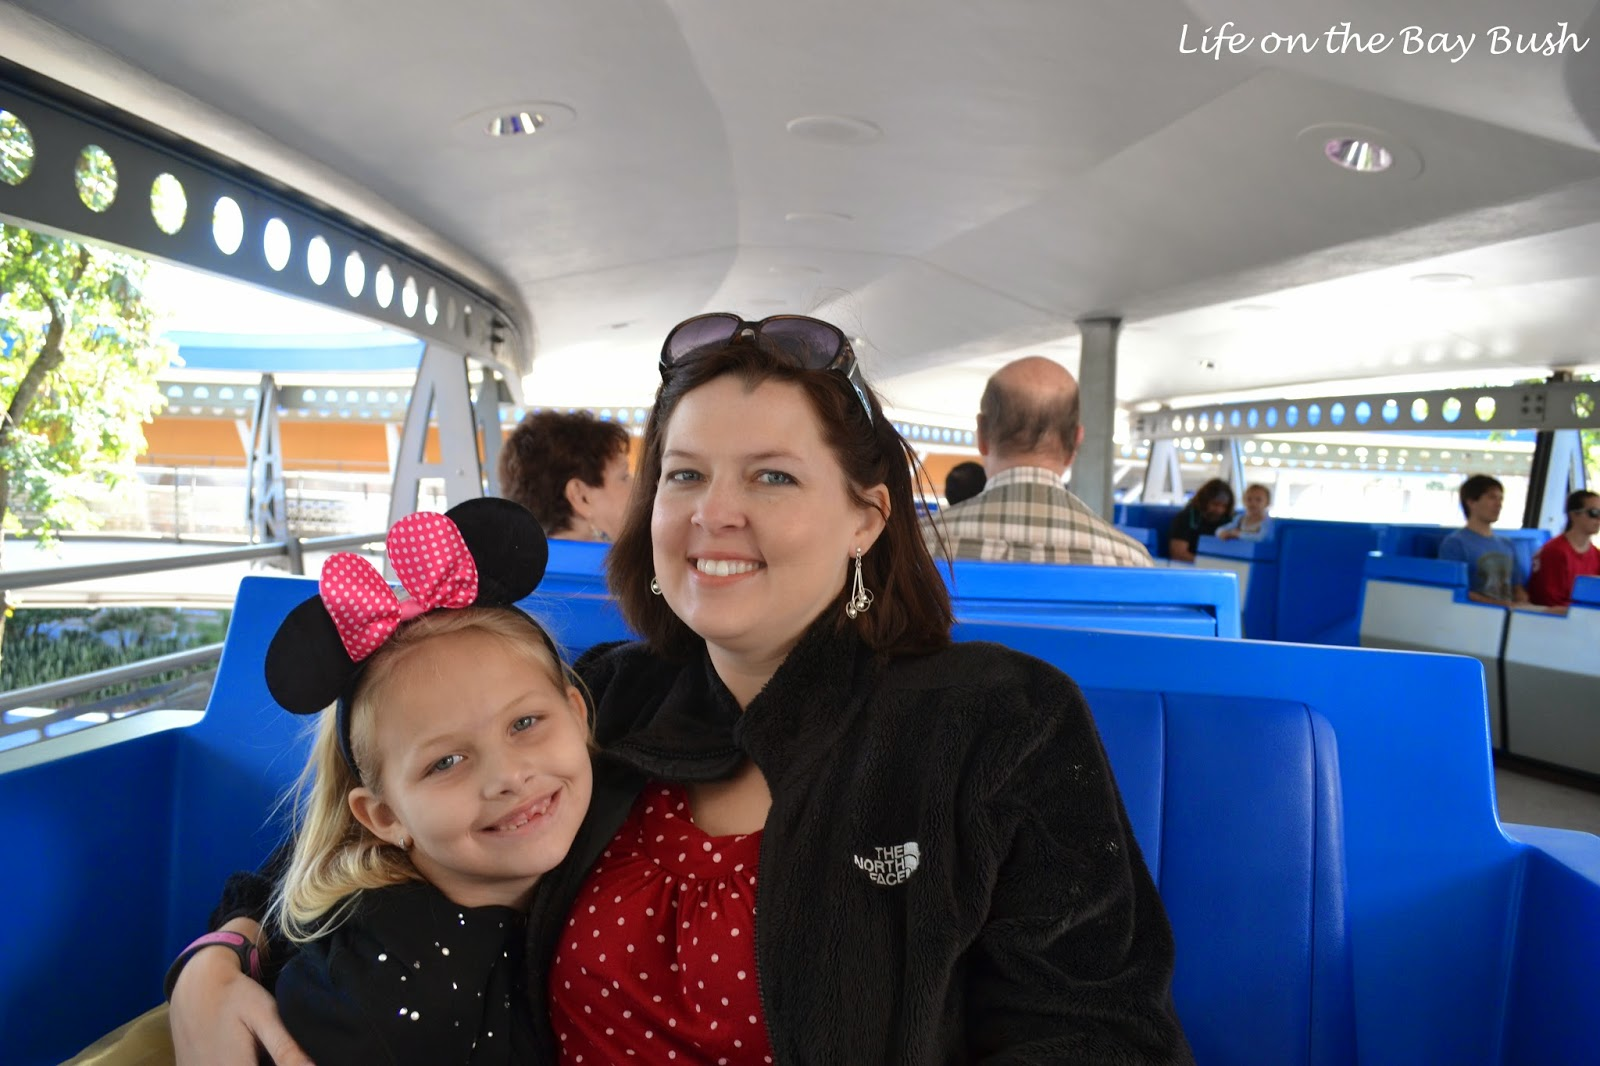 Disney's magic Kingdom - People Mover